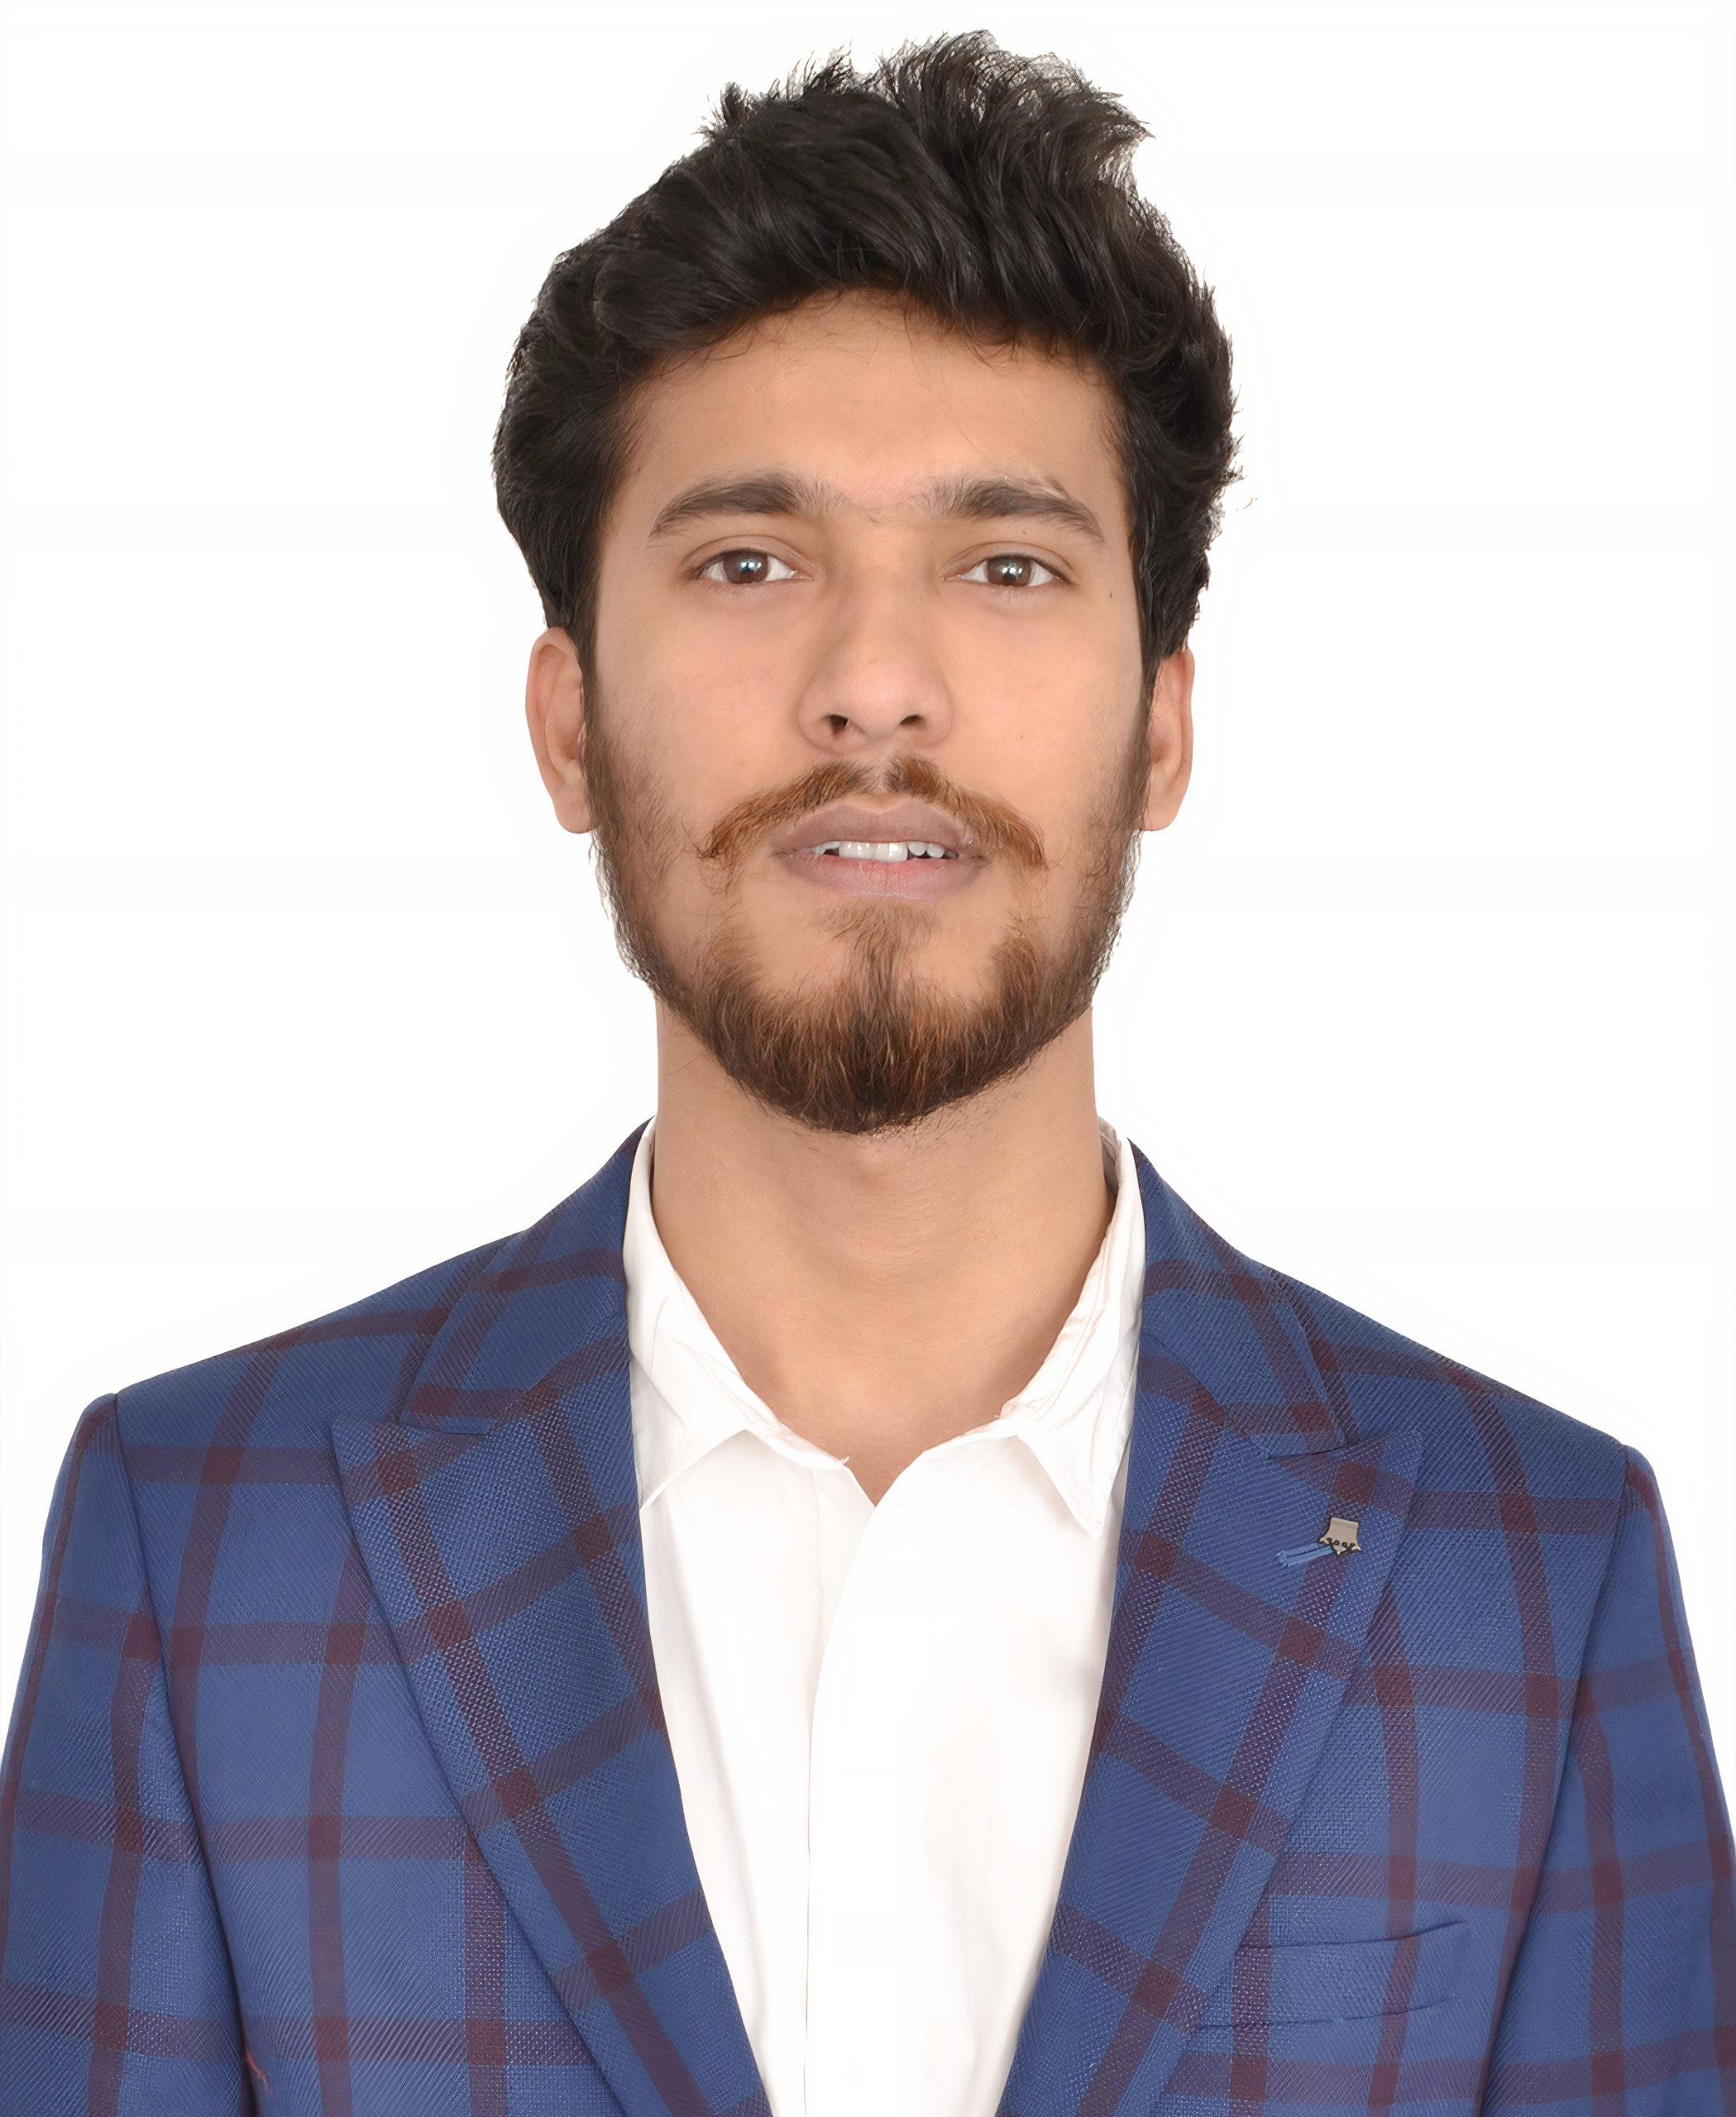 Iftakhar Rahmany